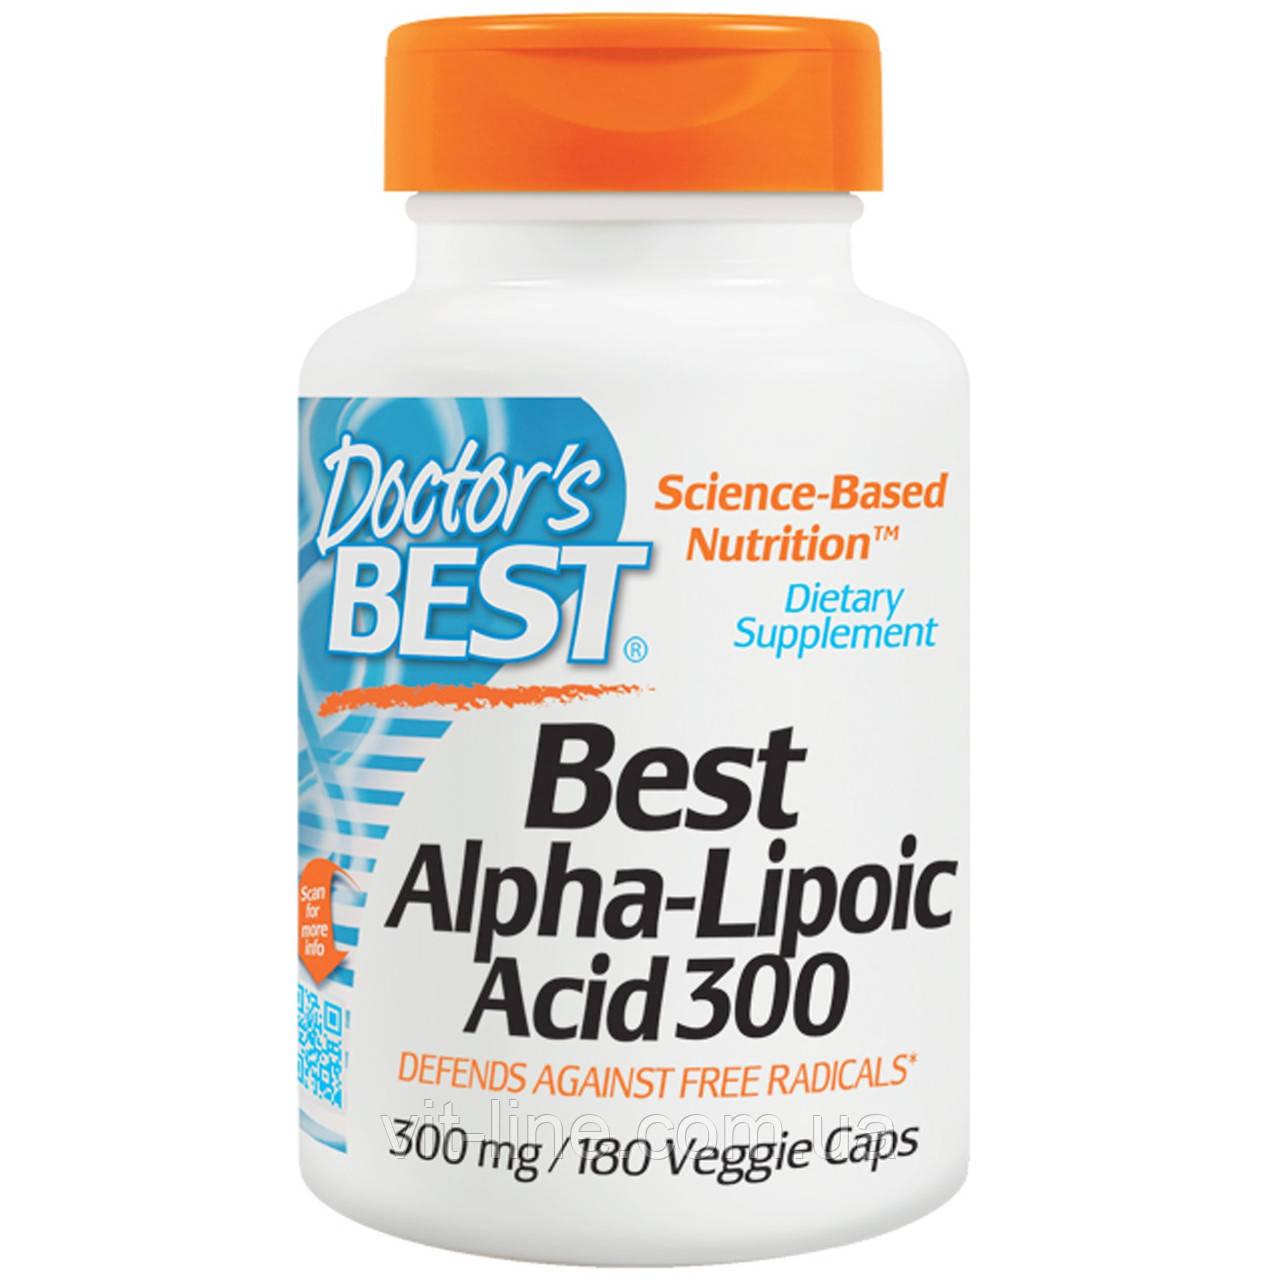 Альфа-Липоевая кислота, 300 мг, 180 капсул от Doctor's Best